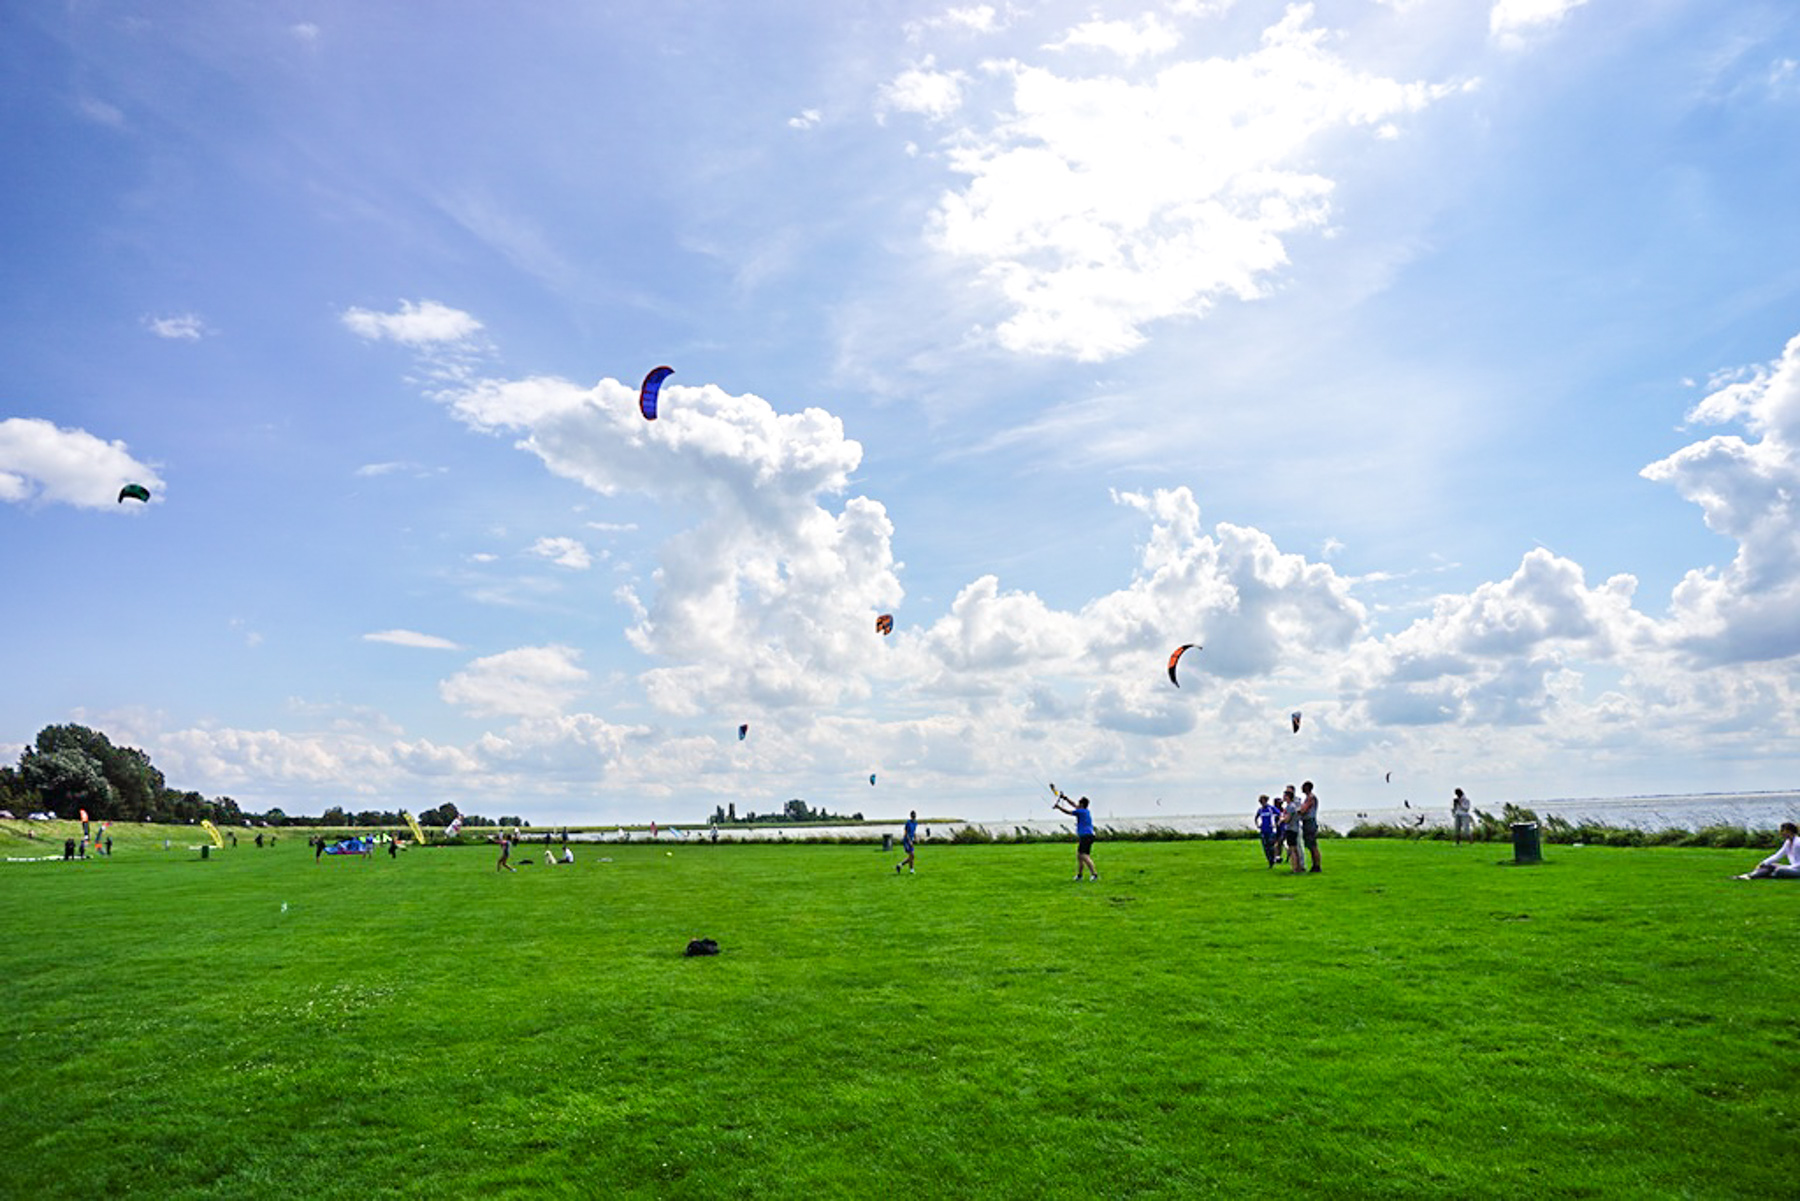 Waterweken Drechterland: Brunch, bootcamp en kiten